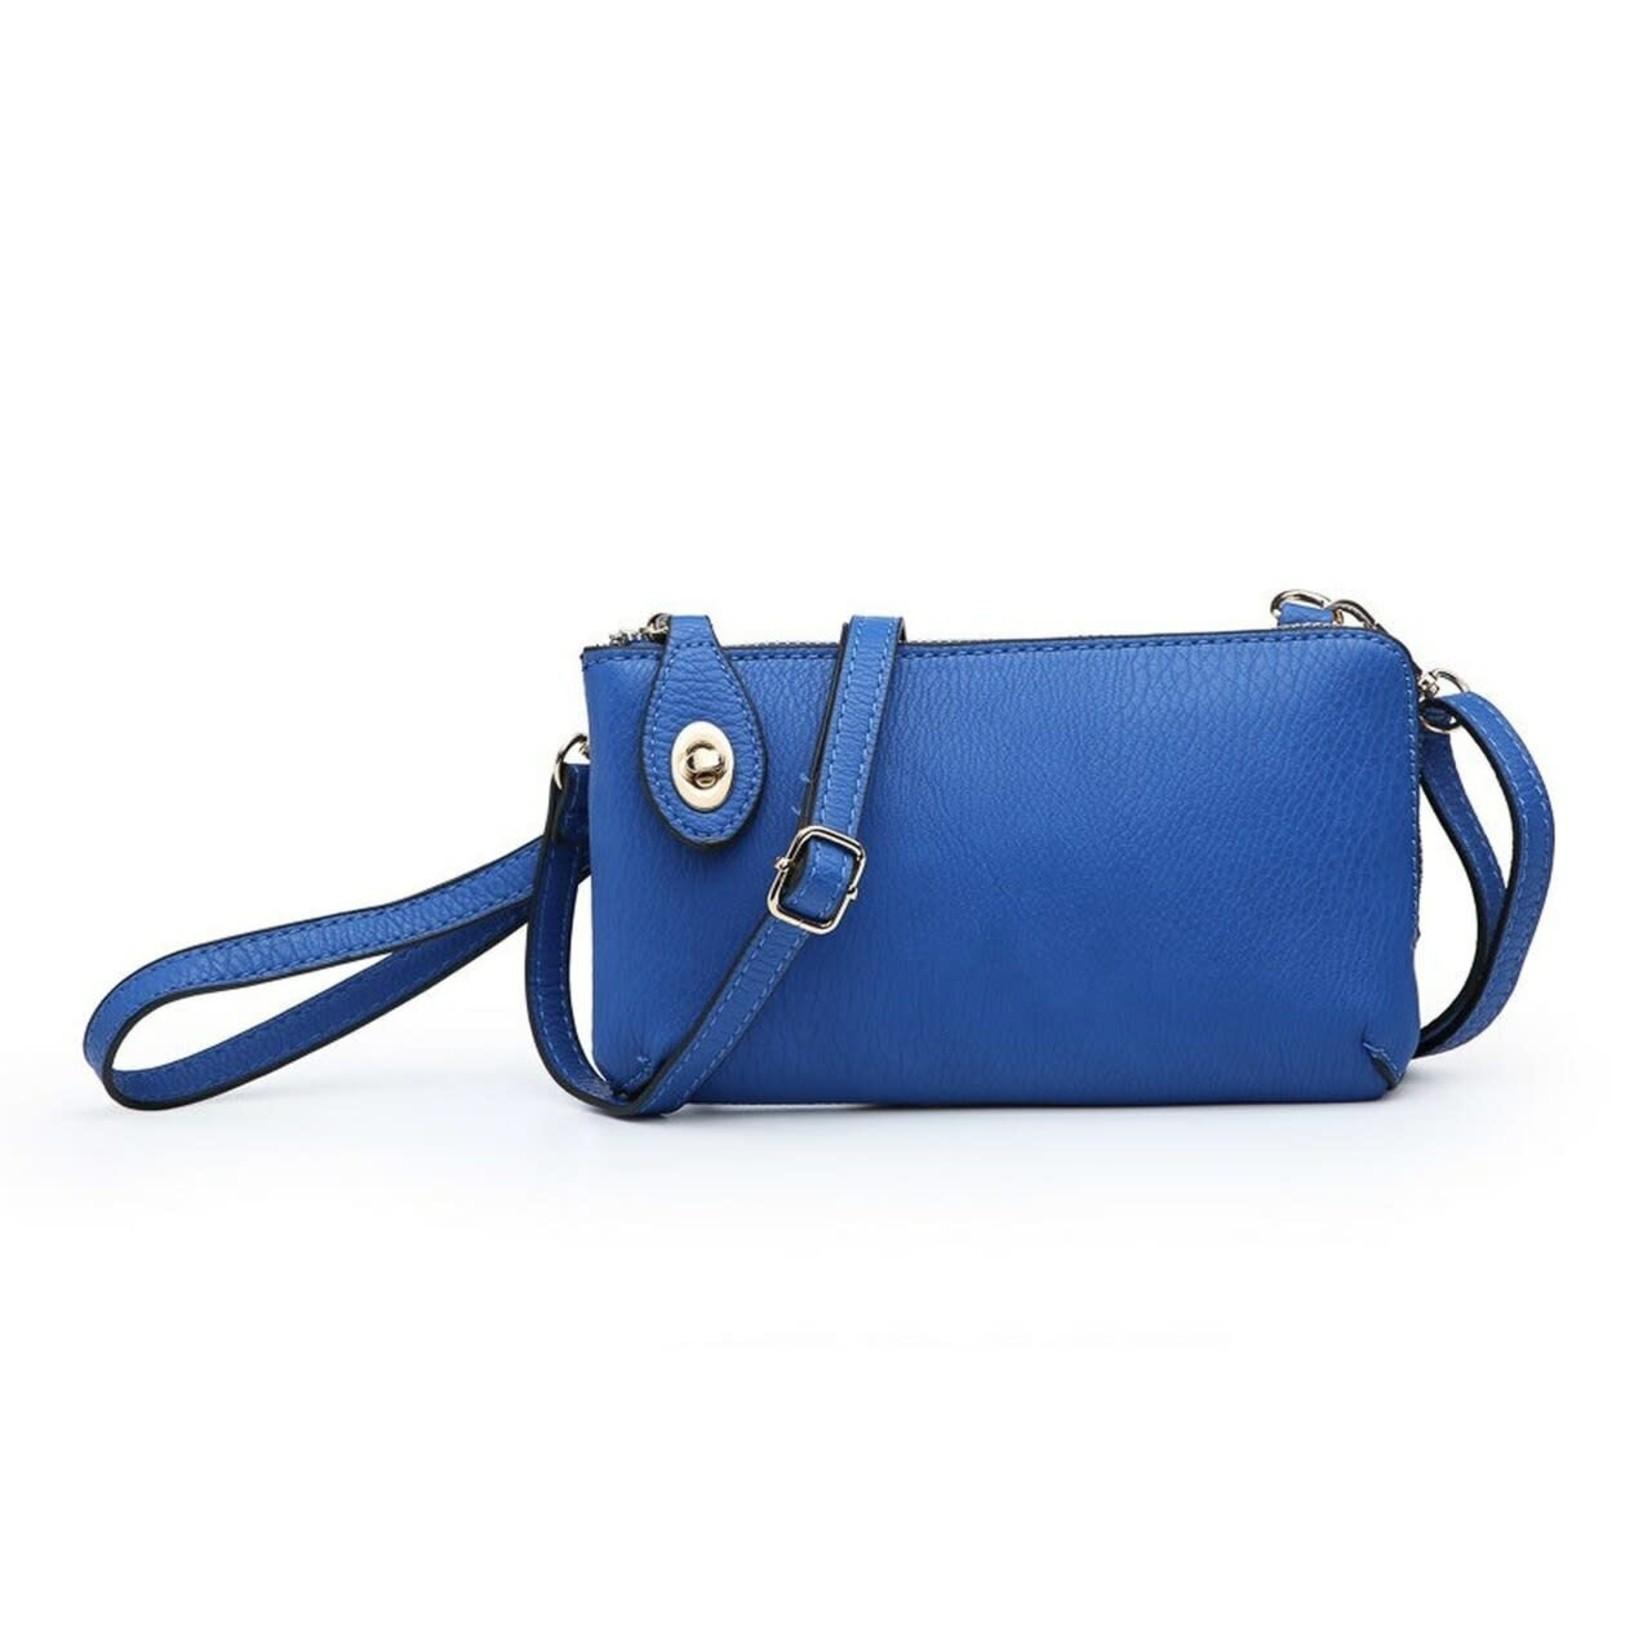 Jen & Co M1818-RBL:  Kendall Crossbody / Wristlet - Royal Blue